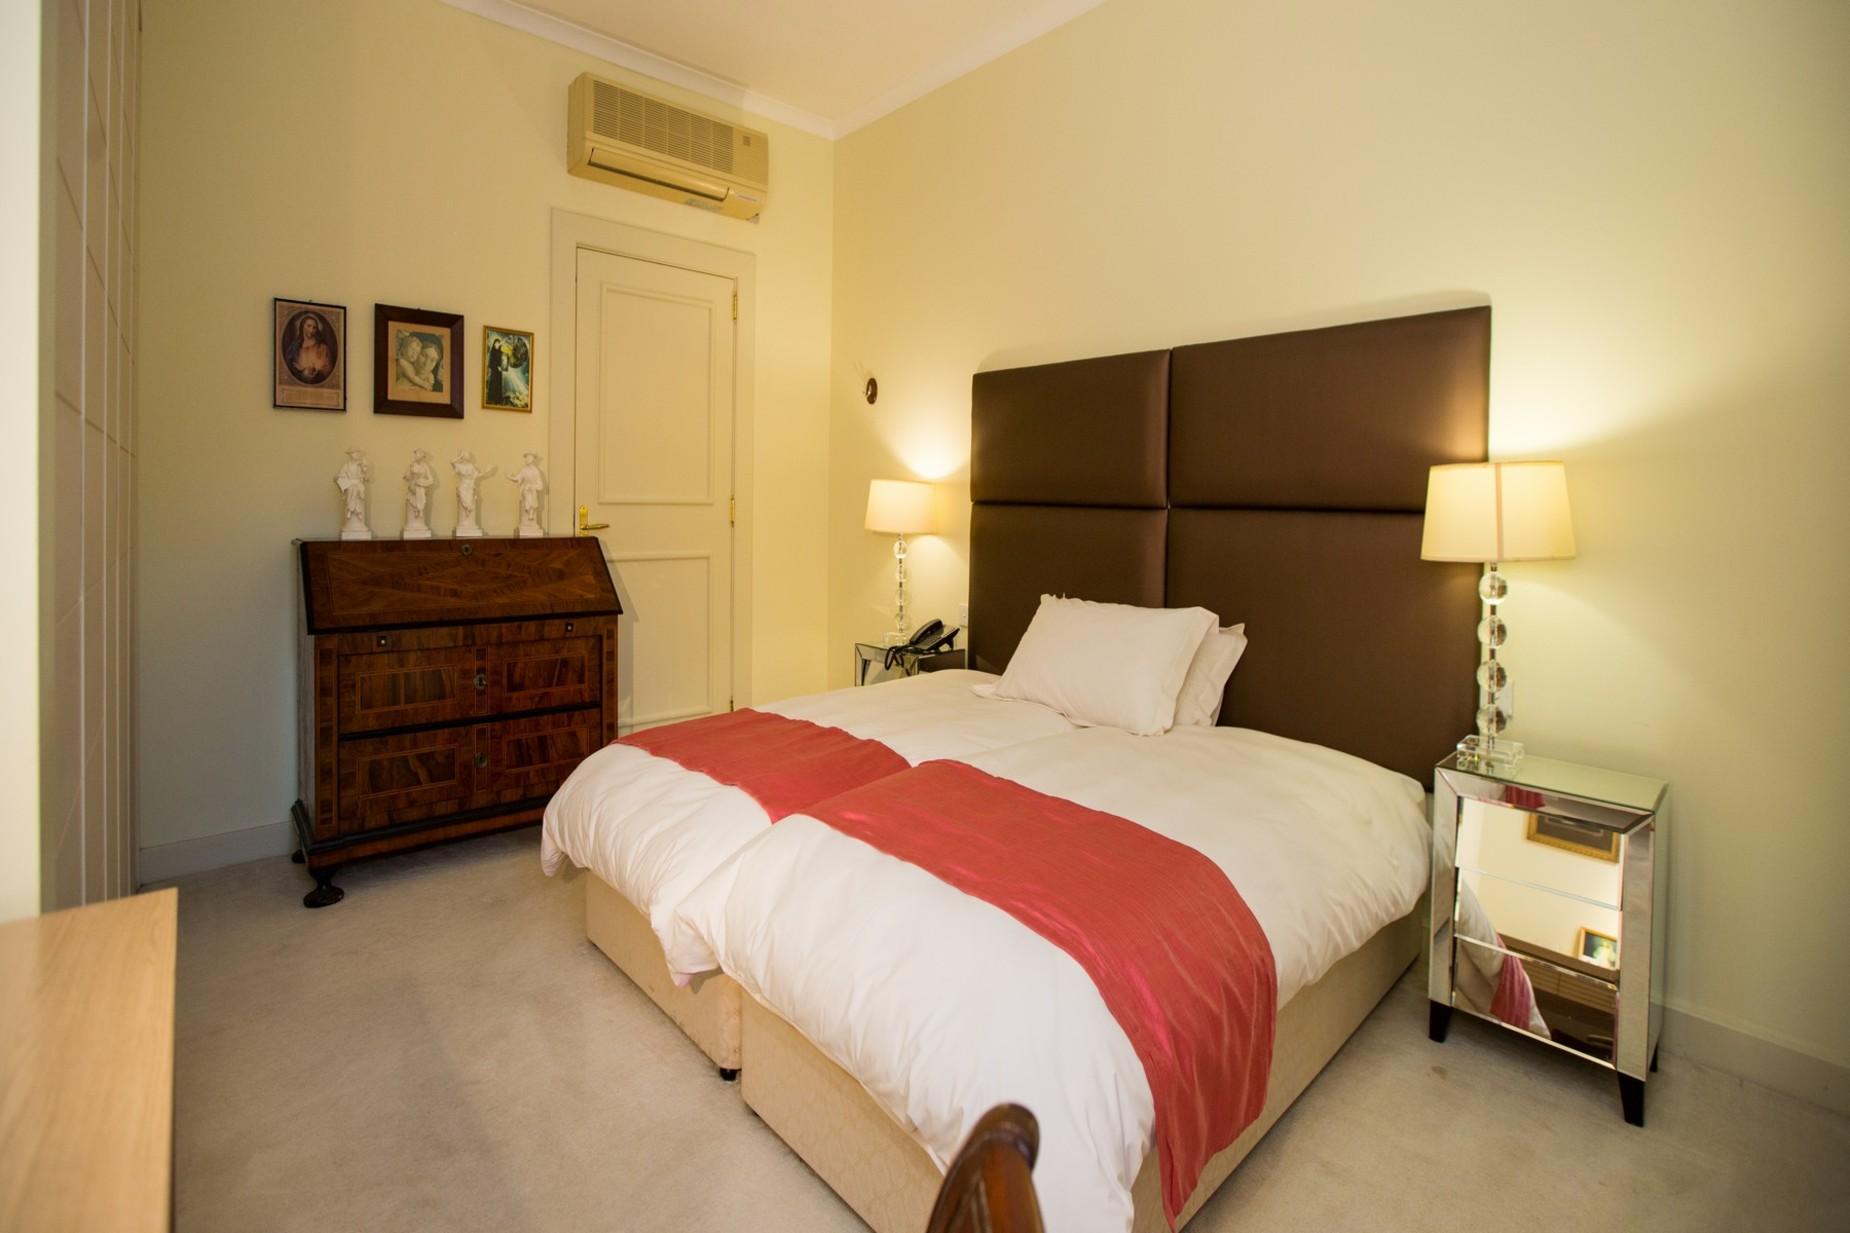 3 bed Villa For Rent in Iklin, Iklin - thumb 8